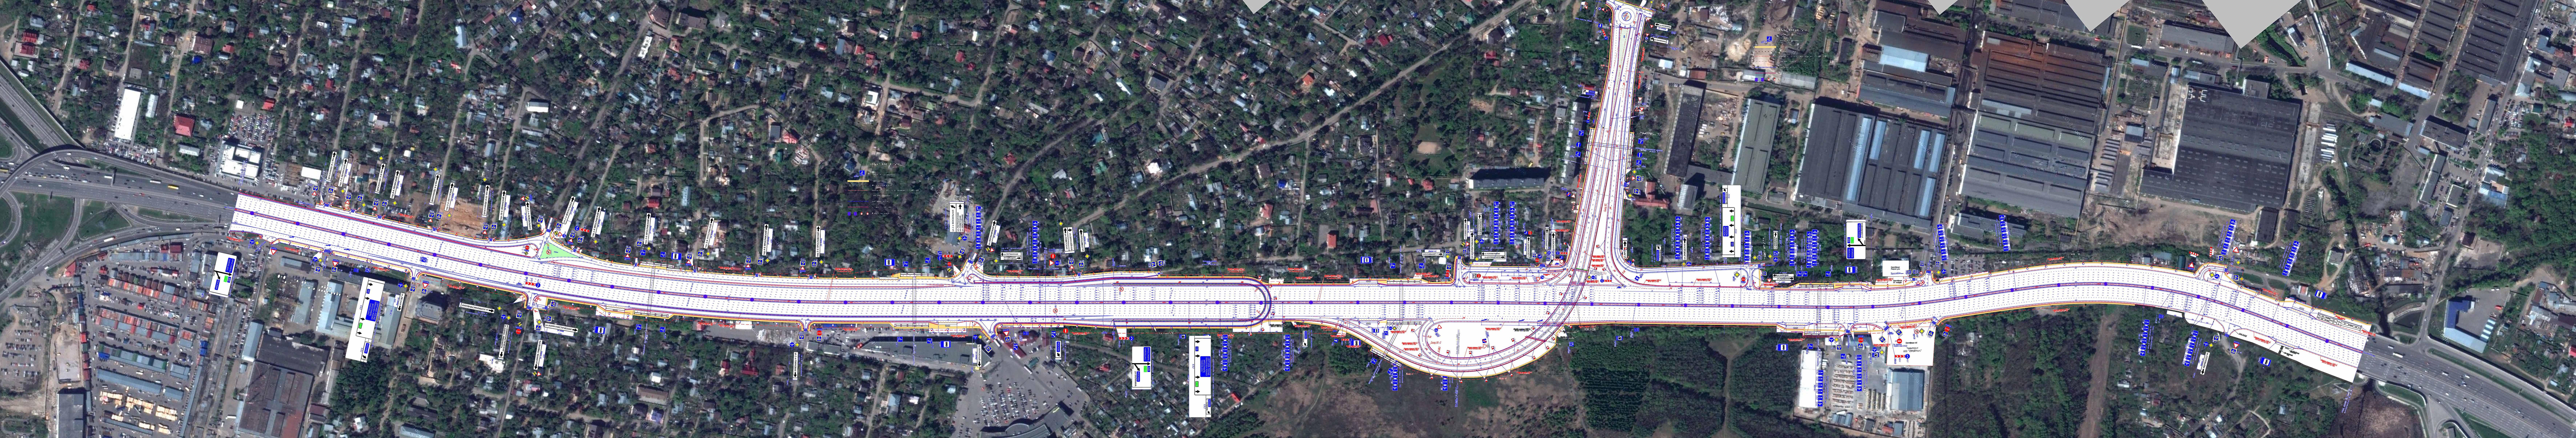 схема развязки на 53 км м4